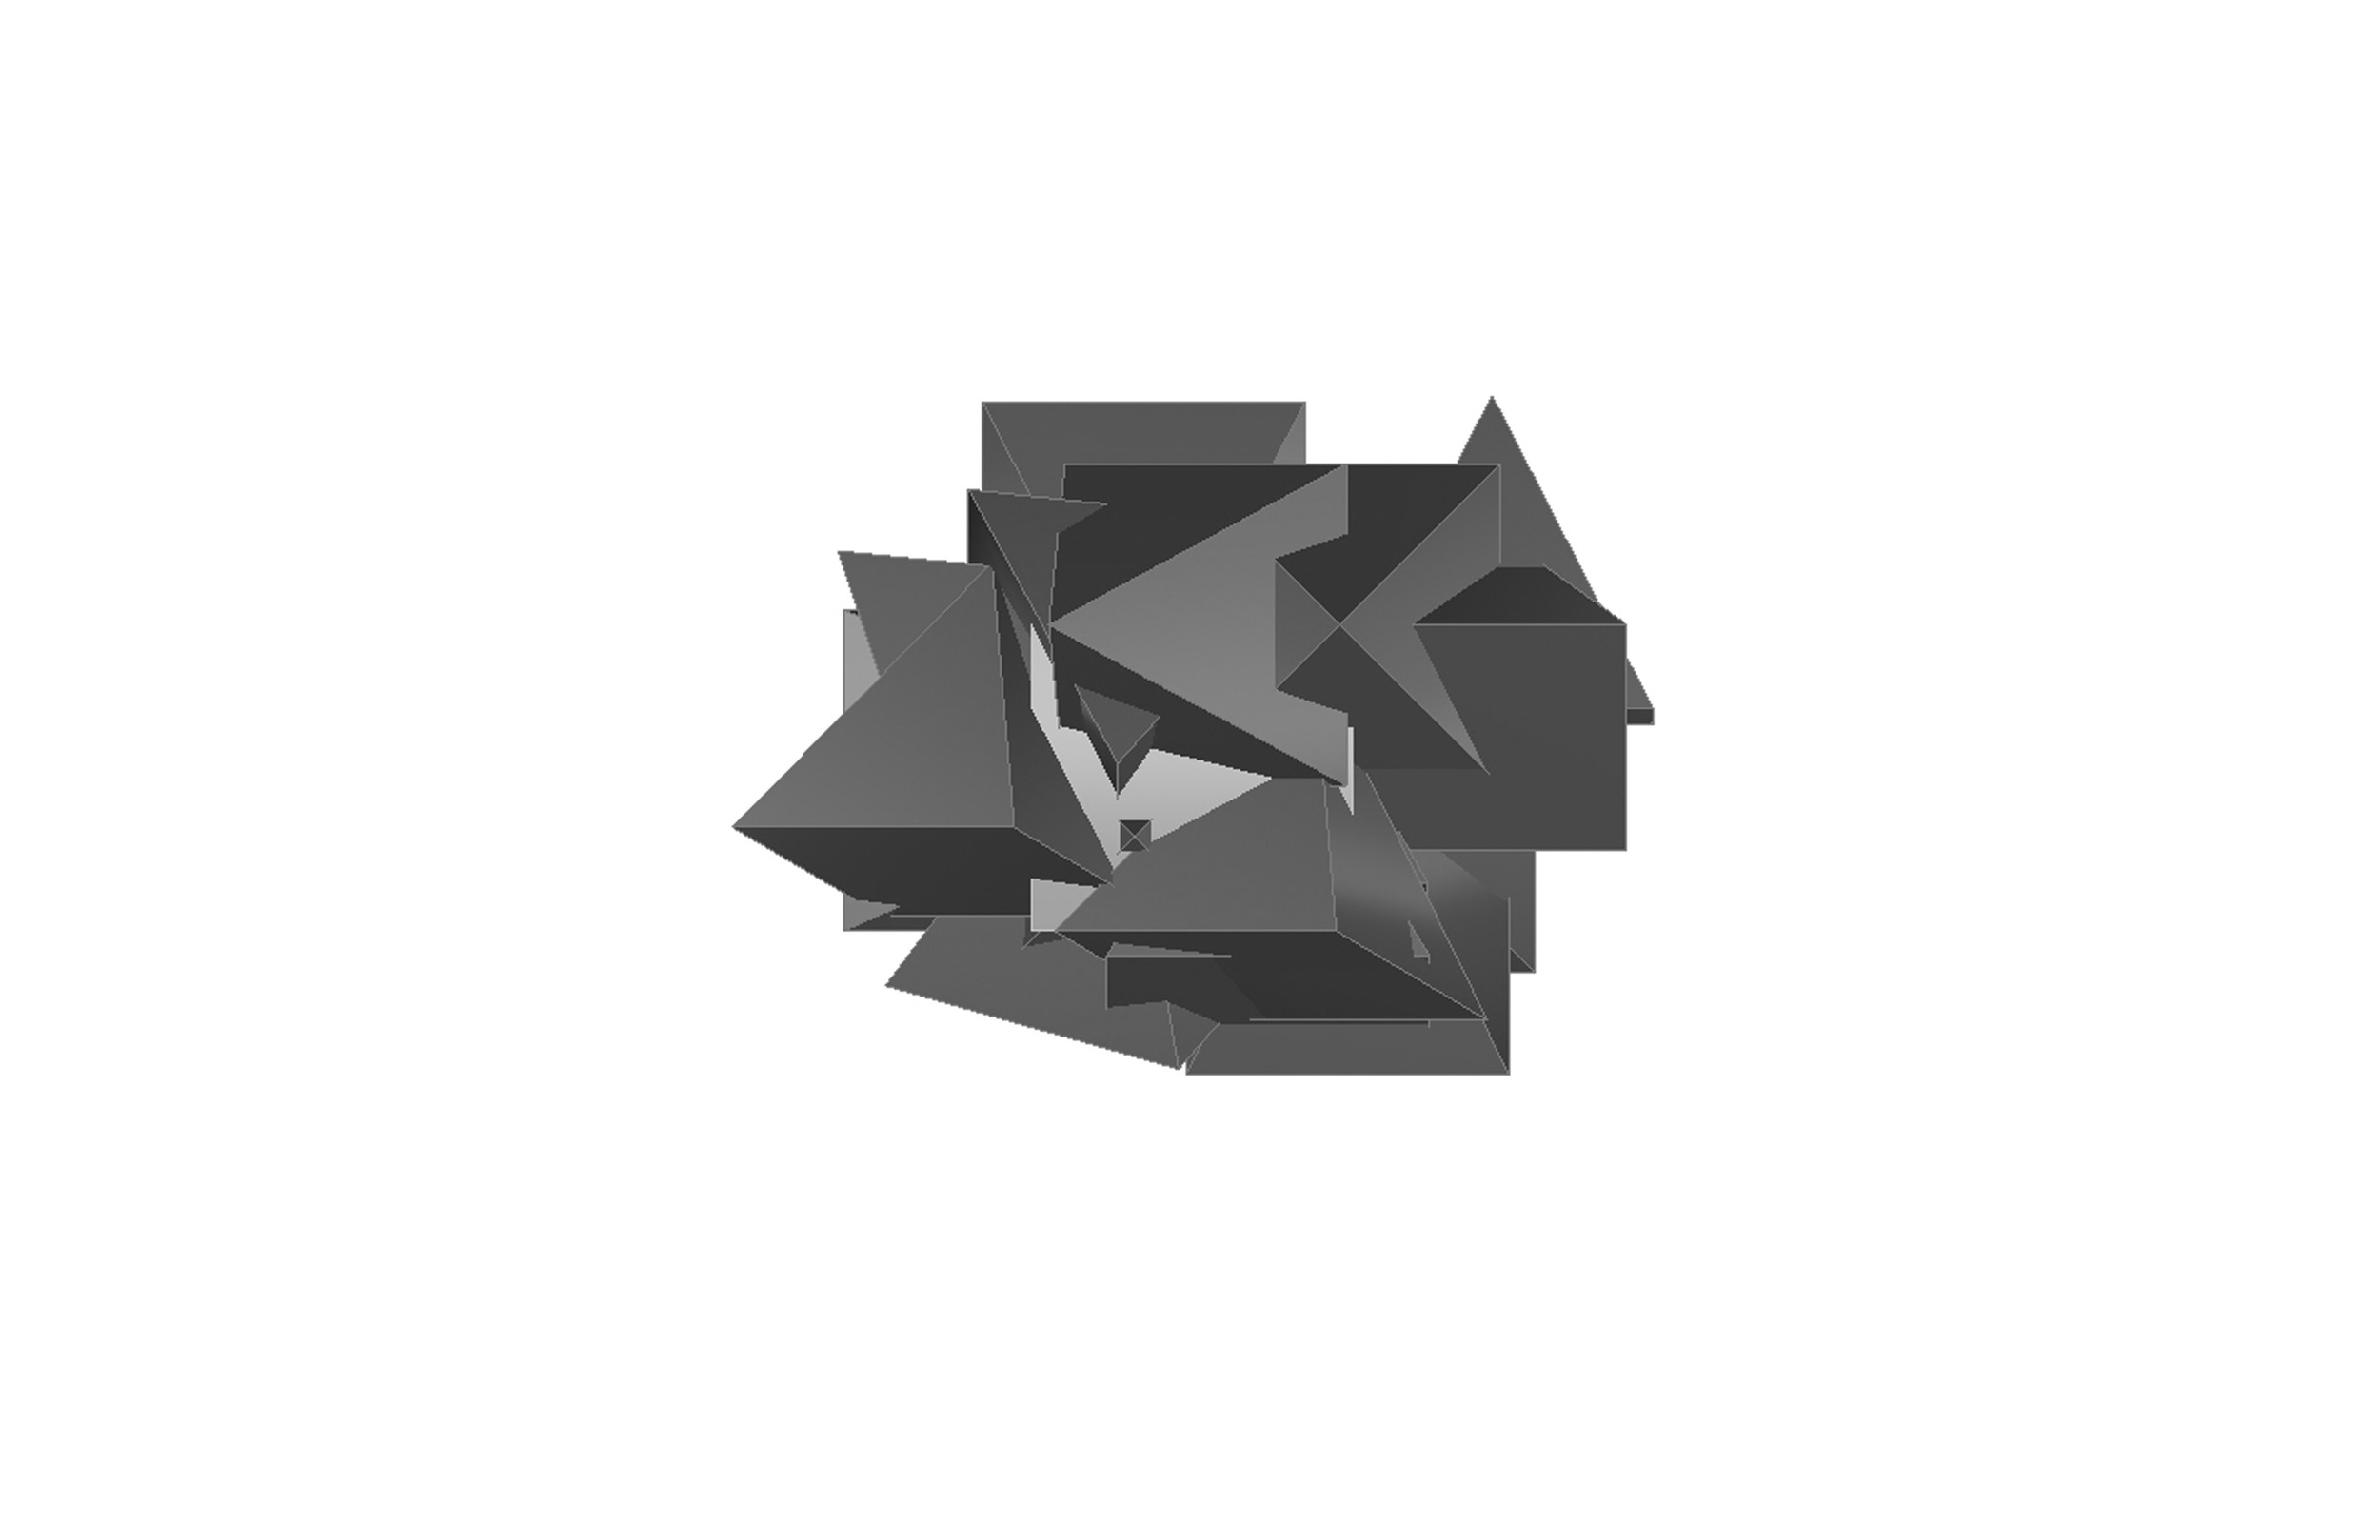 R_LACMA A+T Proposal_Primitive Translation_2.jpg